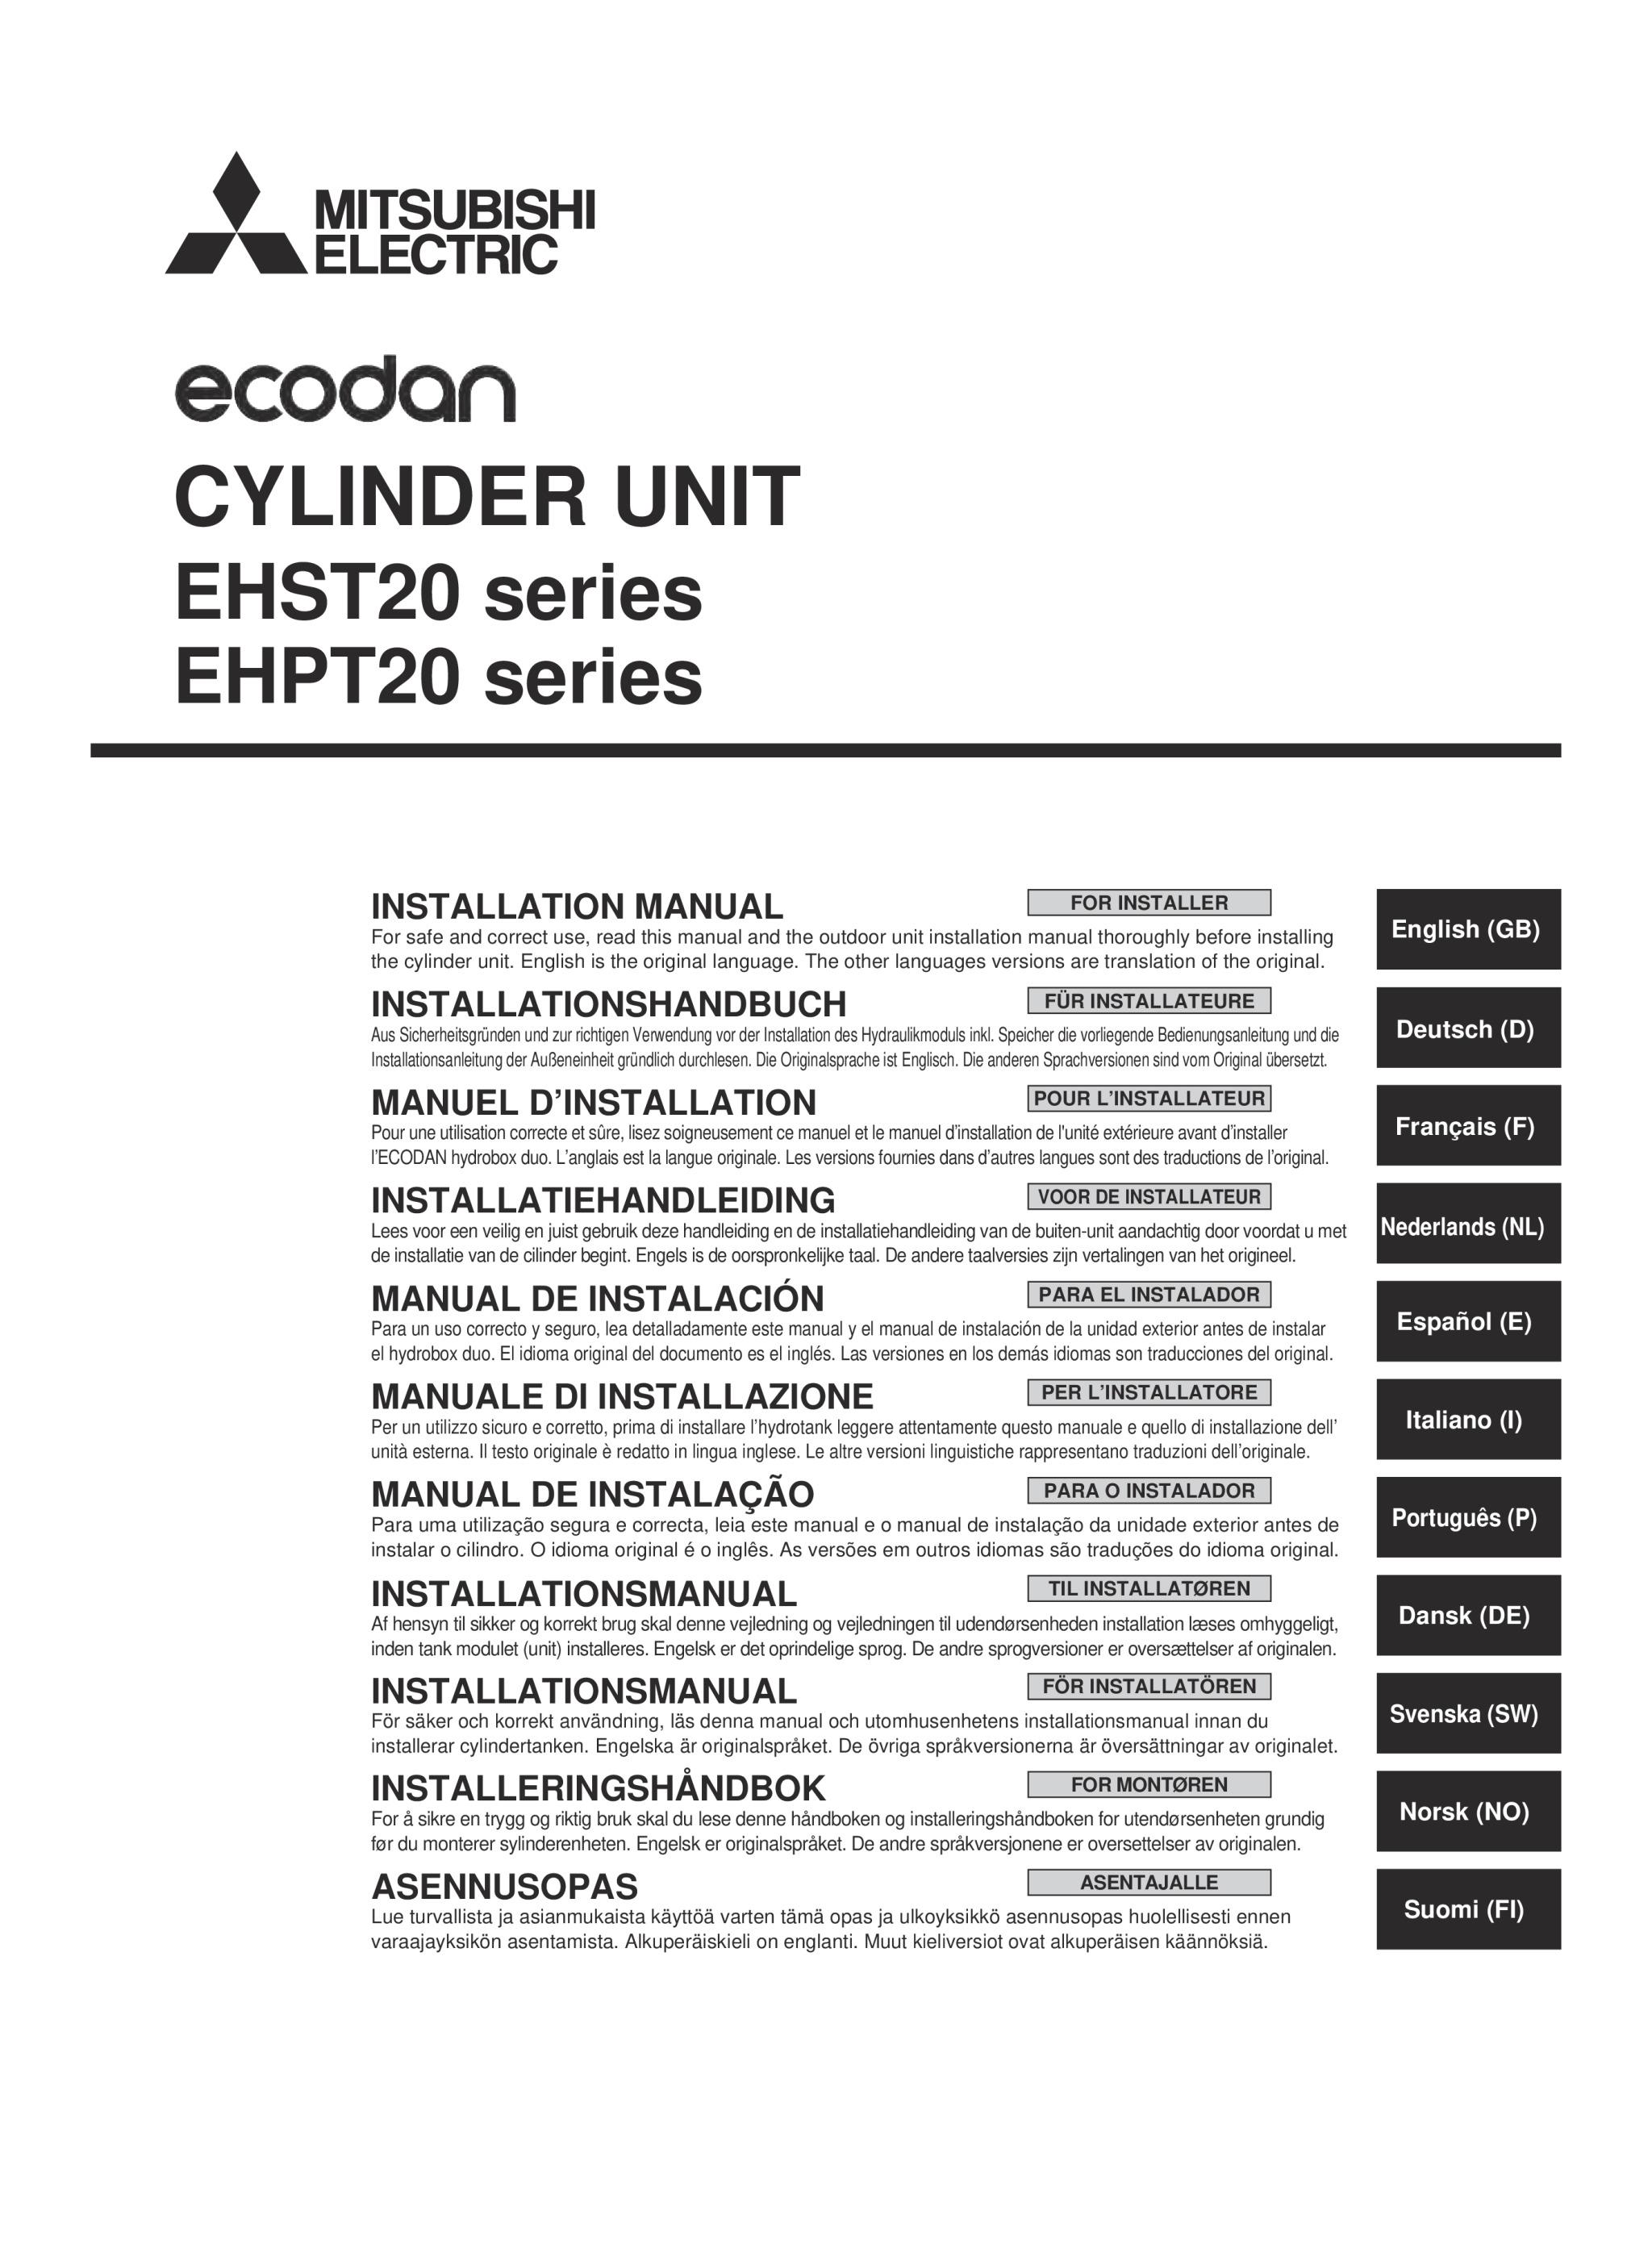 ecodan ehpt20x vm2hb installation manual mitsubishi electric rh library mitsubishielectric co uk mitsubishi ecodan installation guide mitsubishi ecodan installation instructions